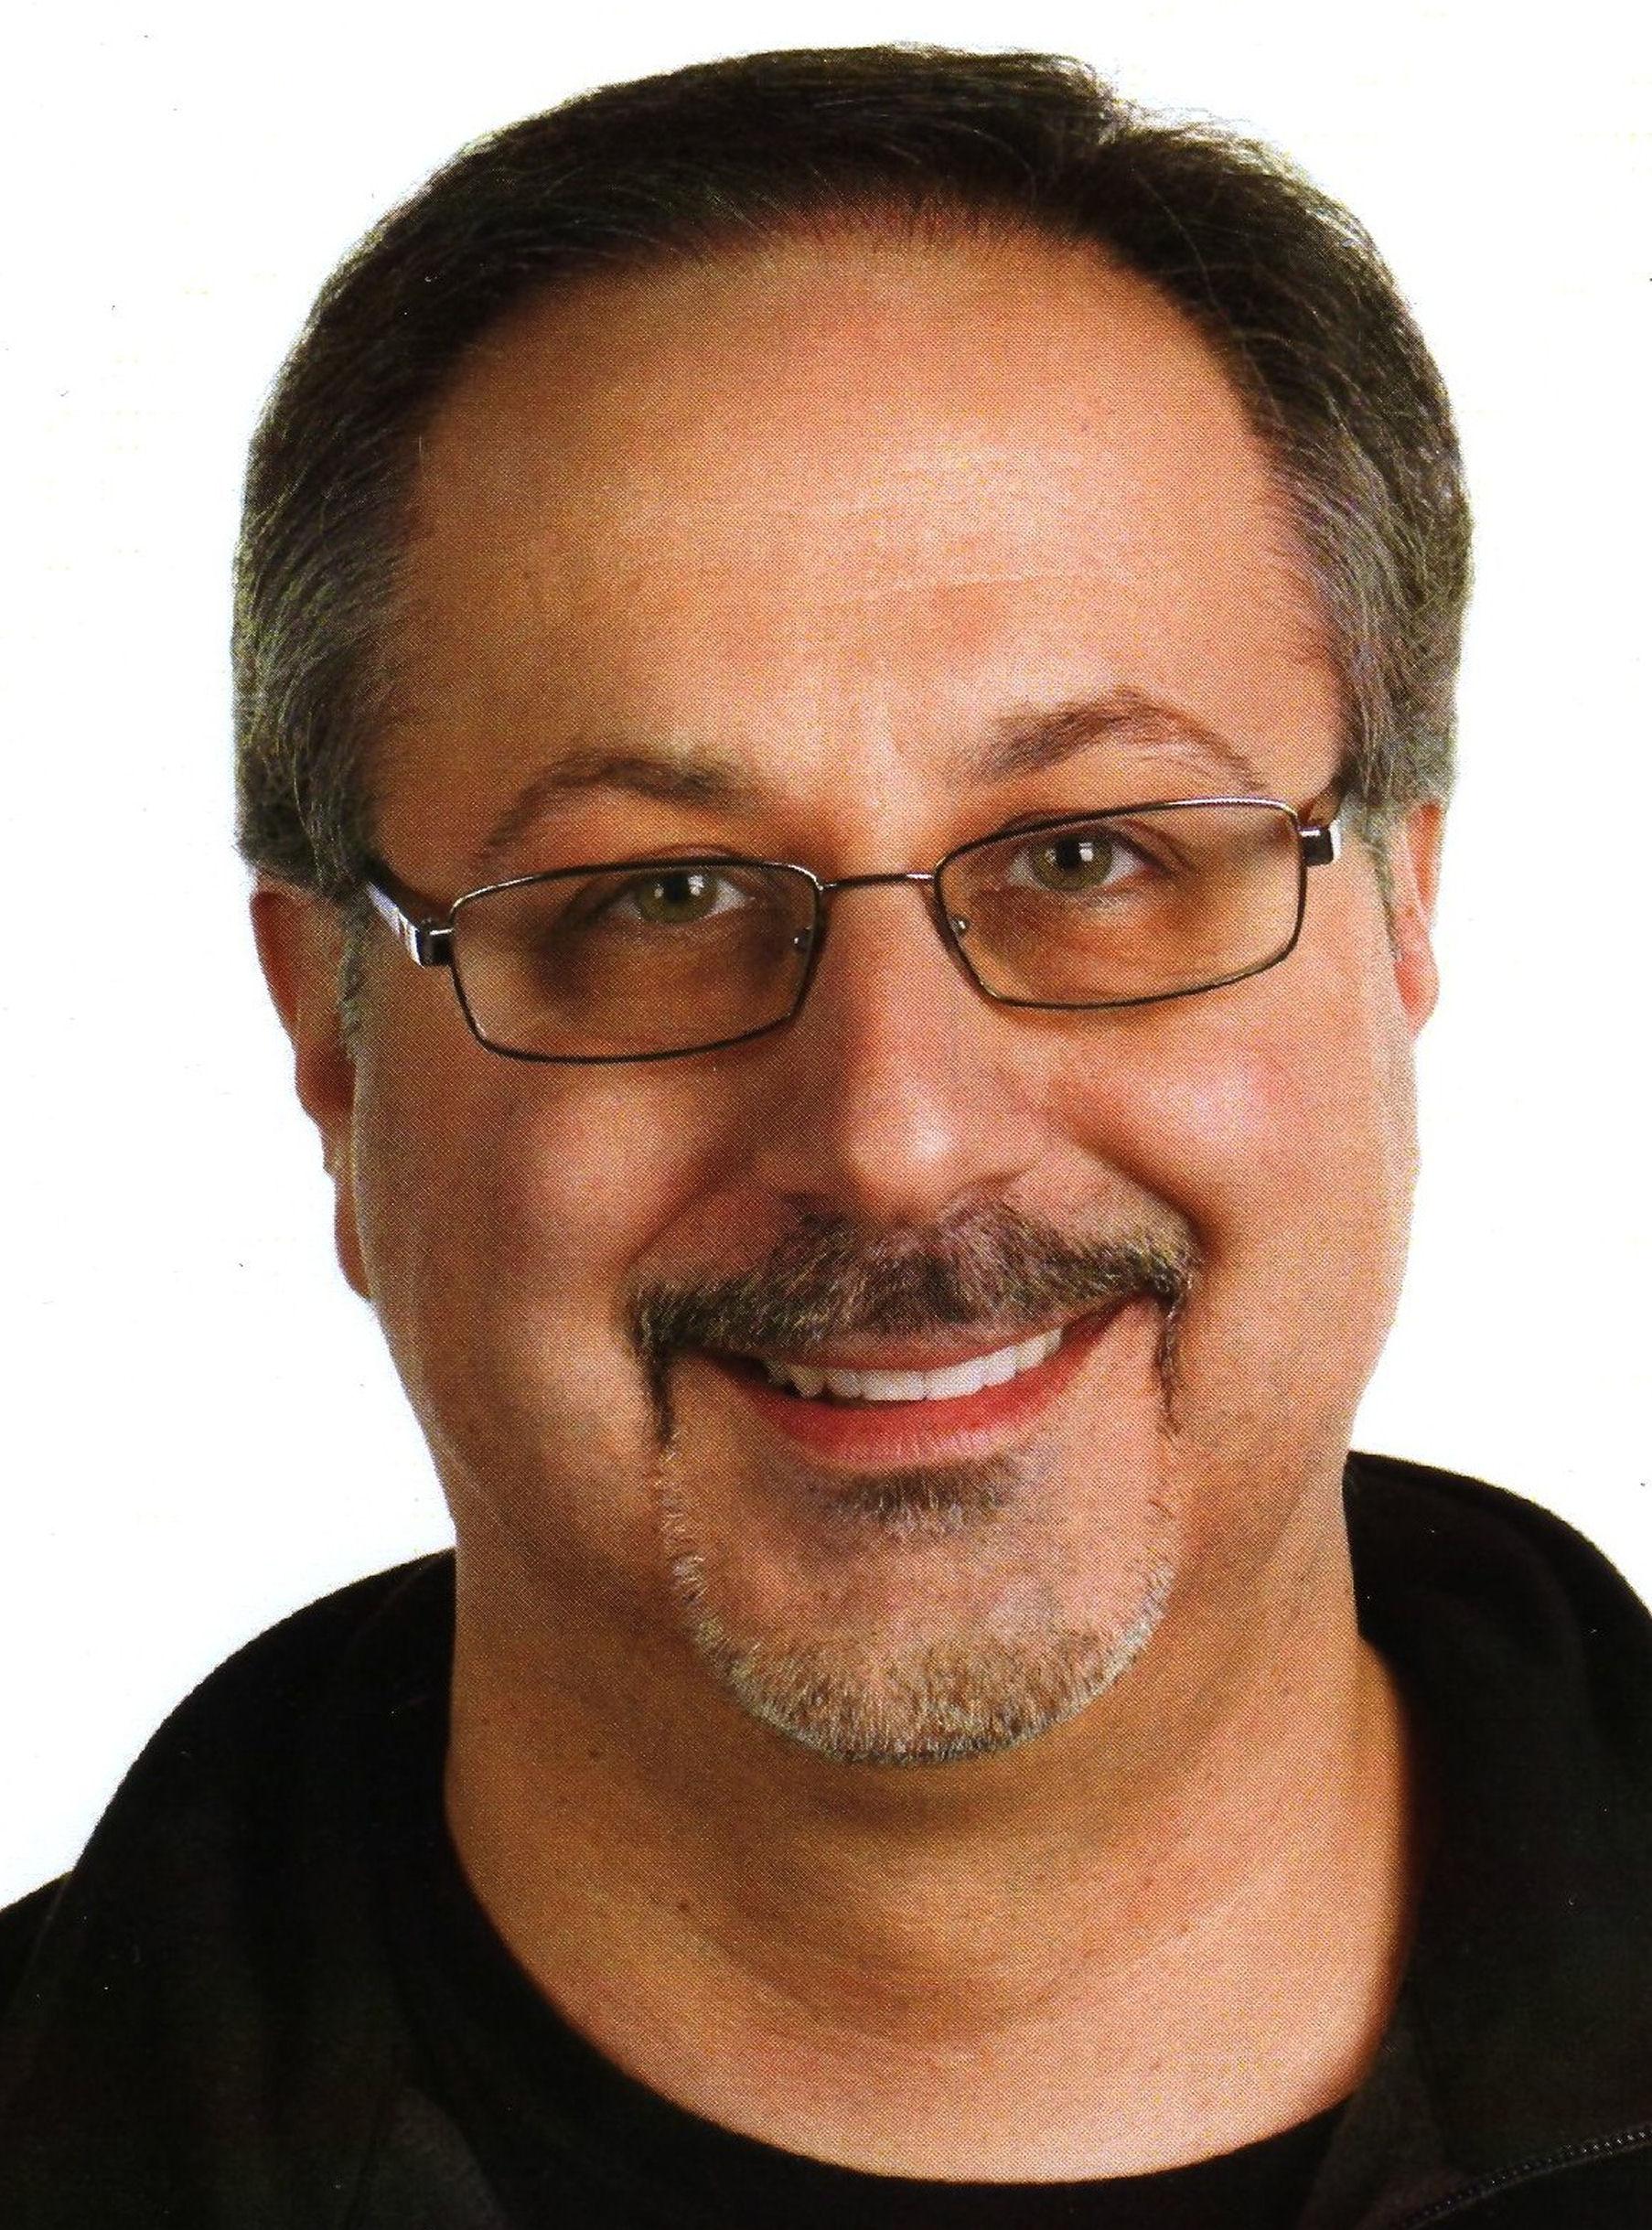 Thompson's Paul Greco Named Chair of 2015 AMP Awards Advisory Board